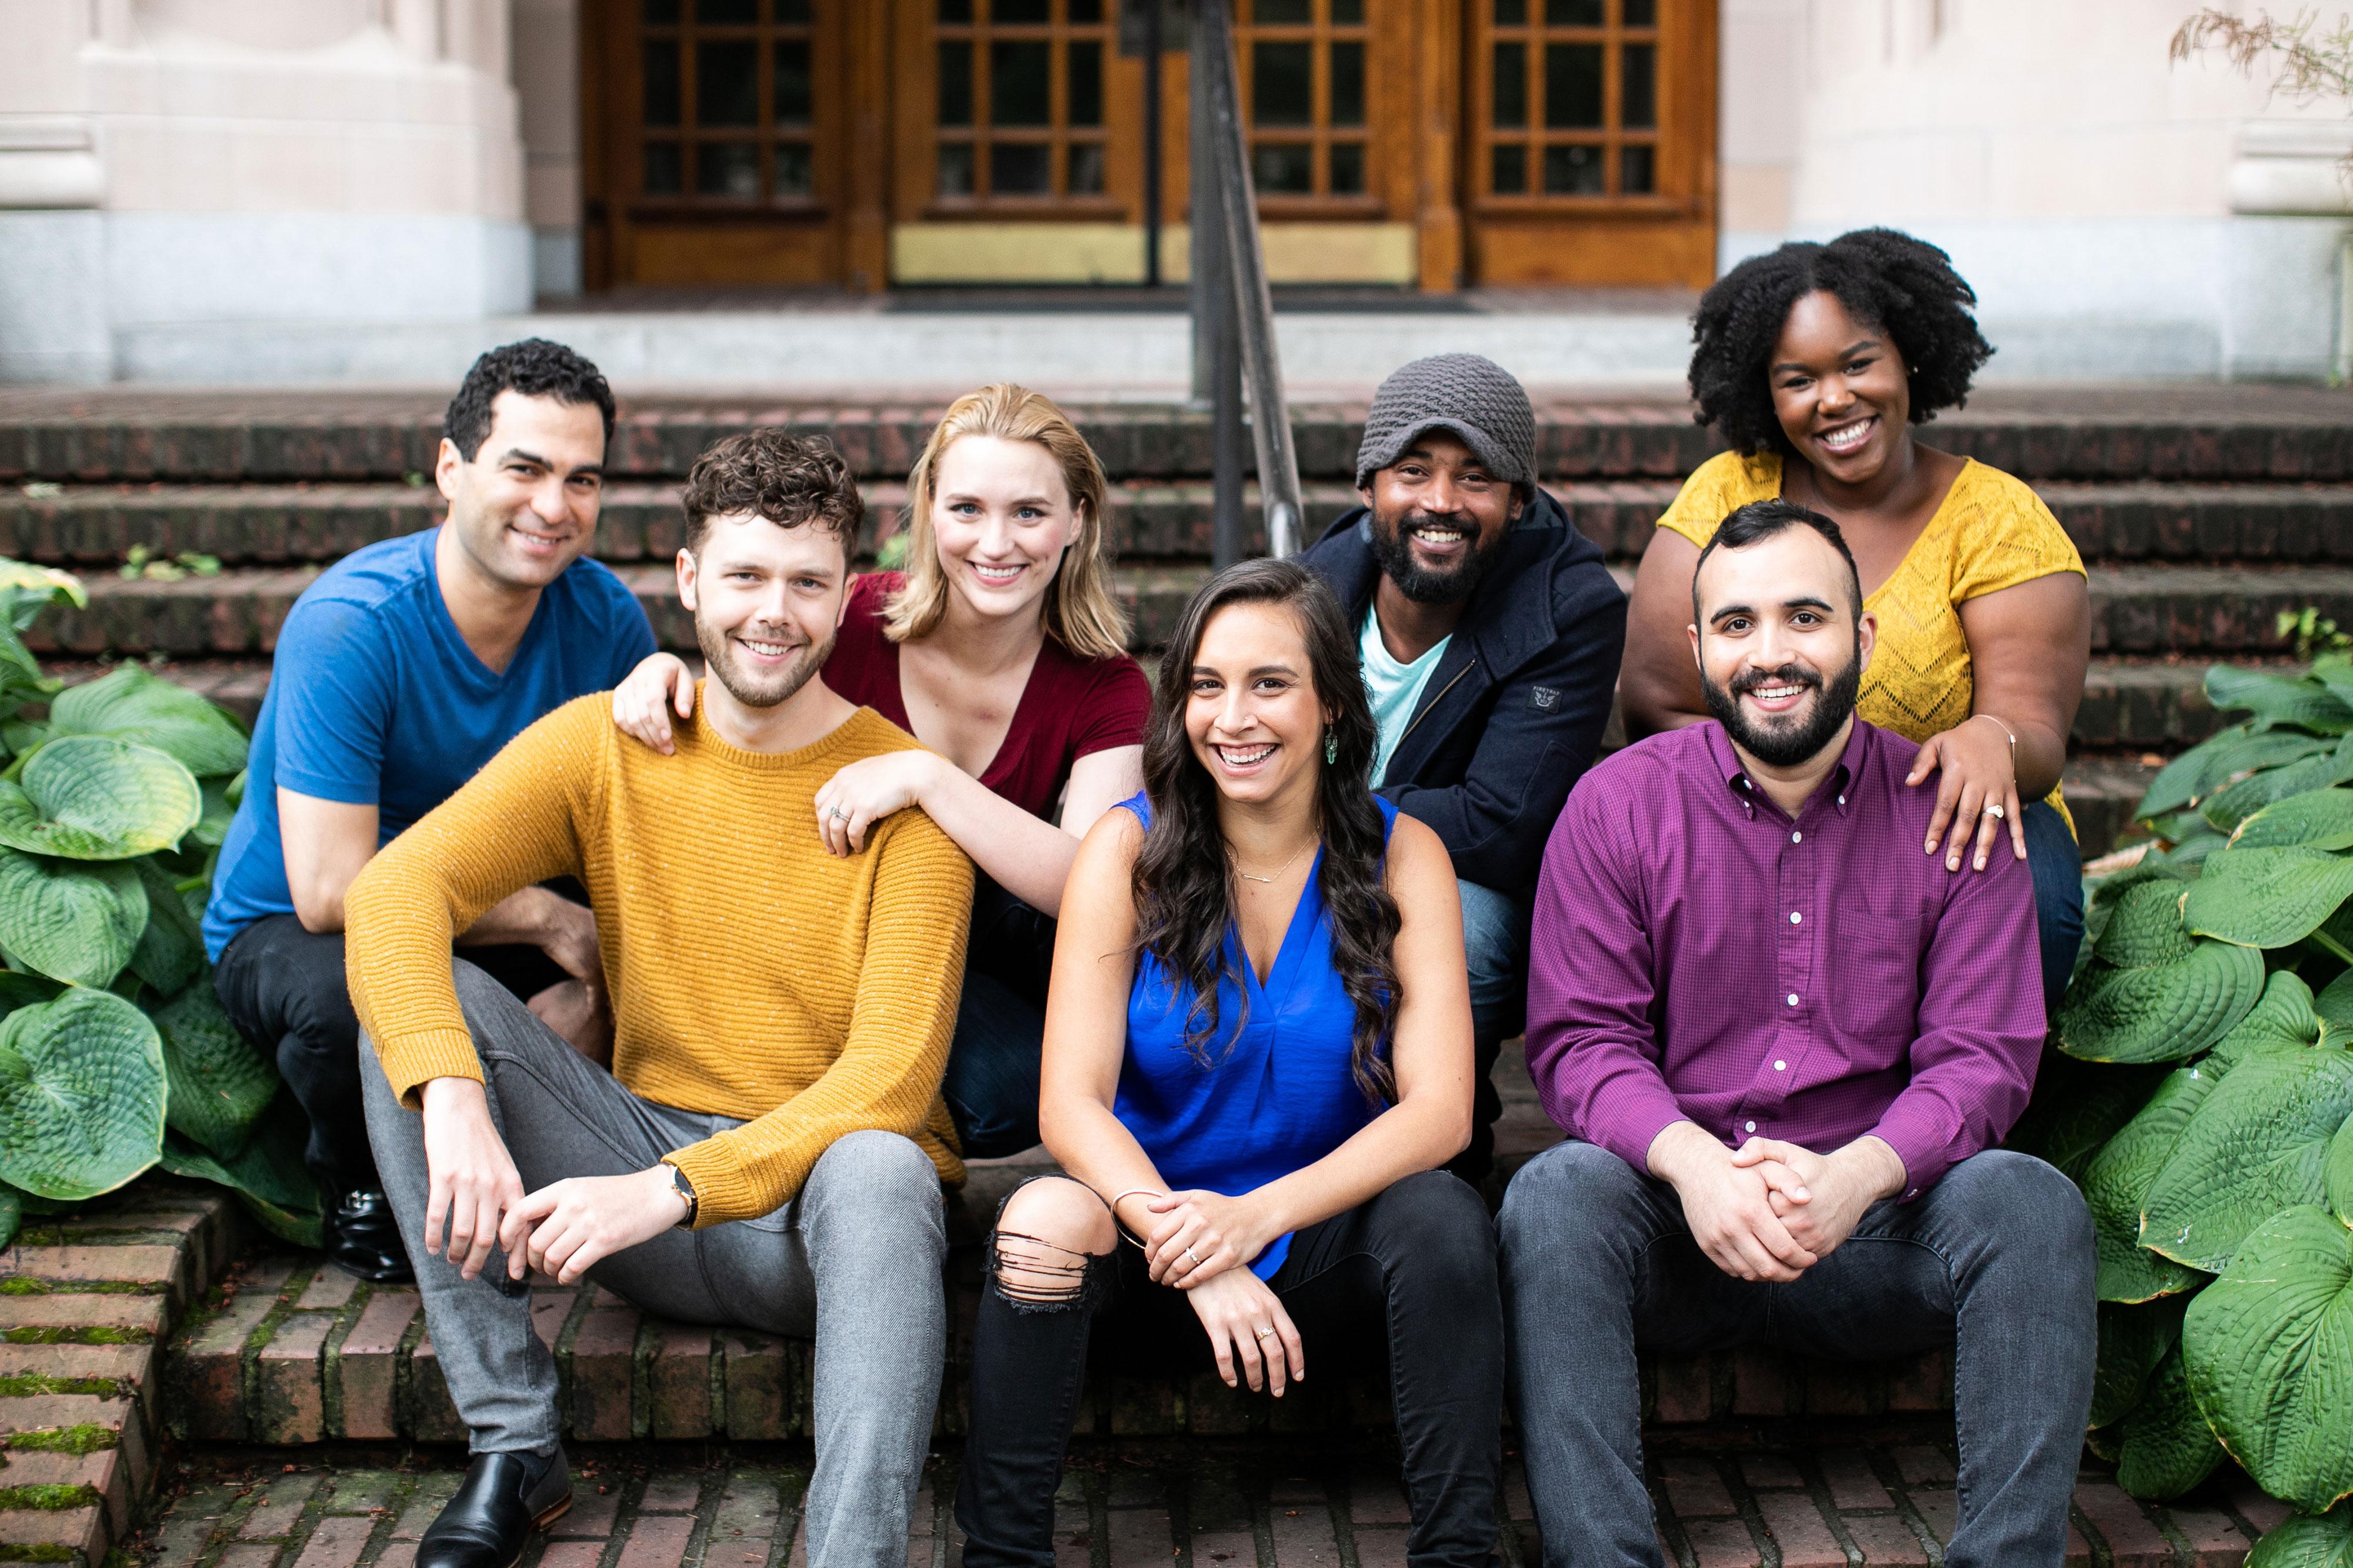 Meet the UW Professional Actor Training Program Class of